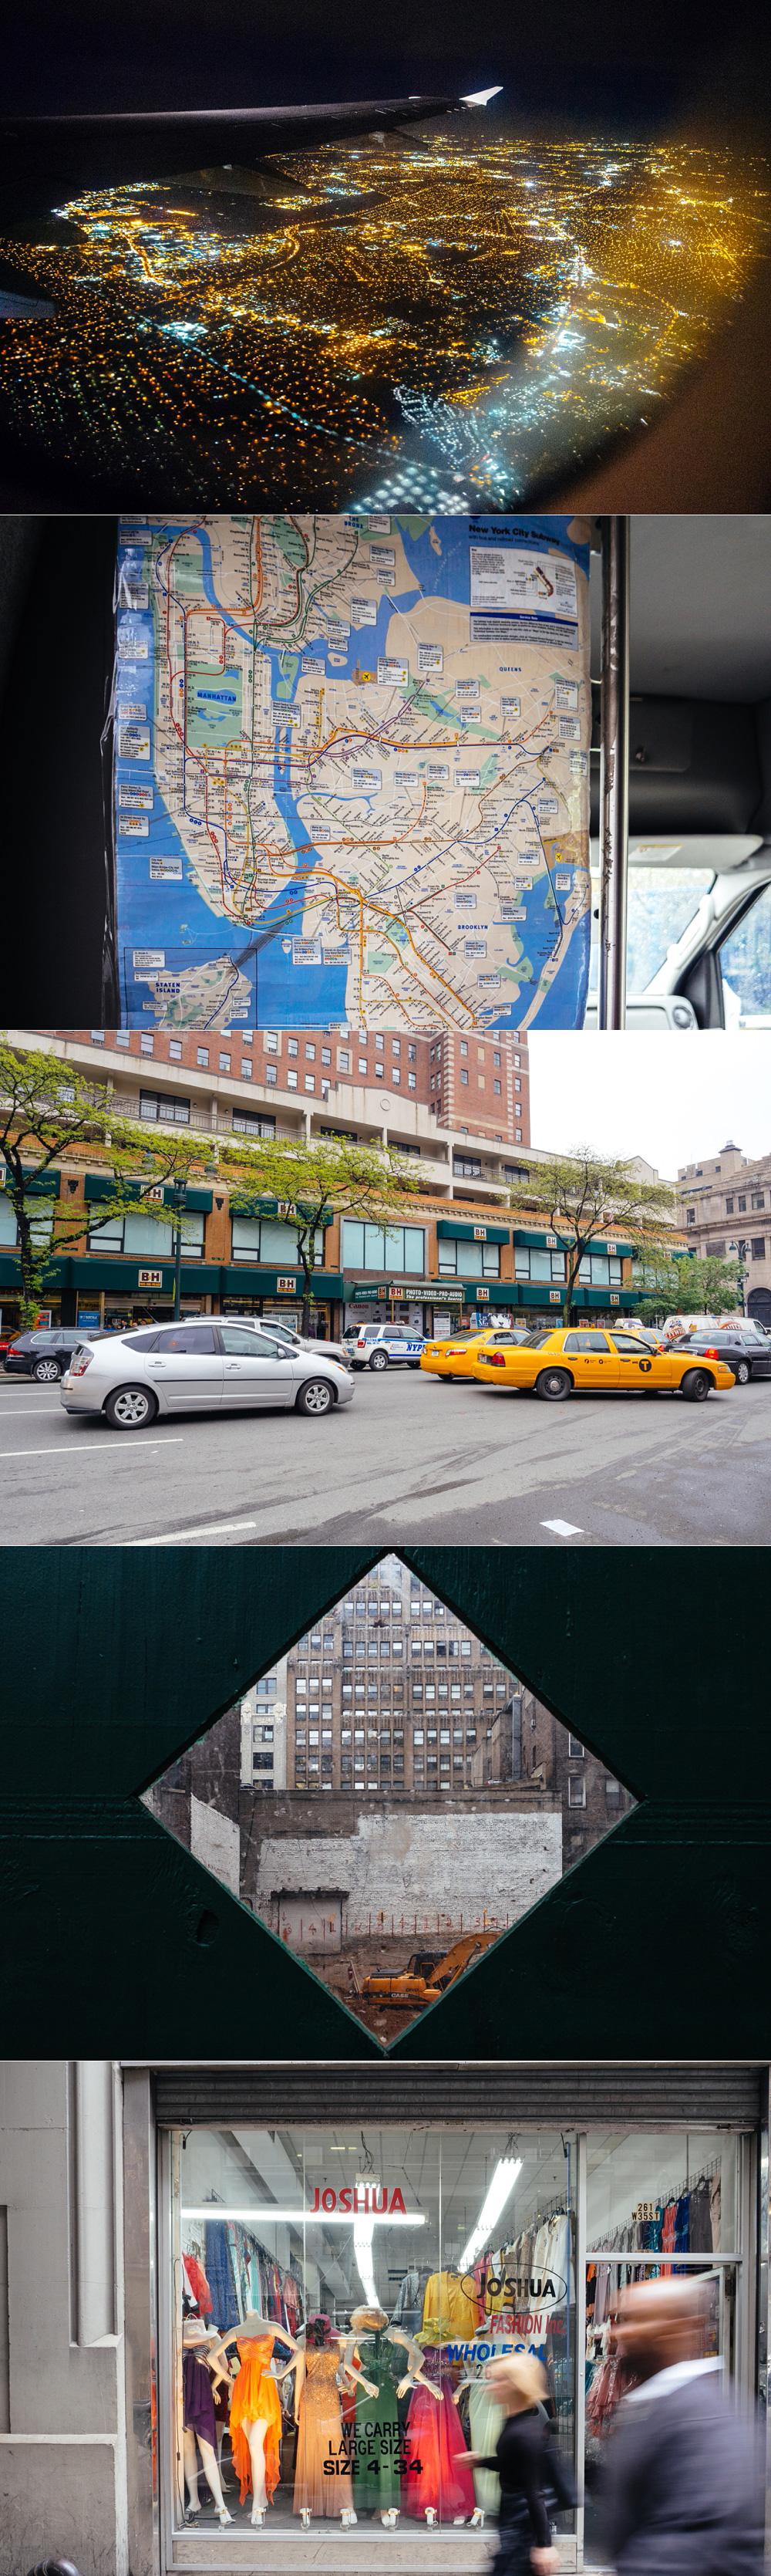 NYC-Continuum-Photography-01